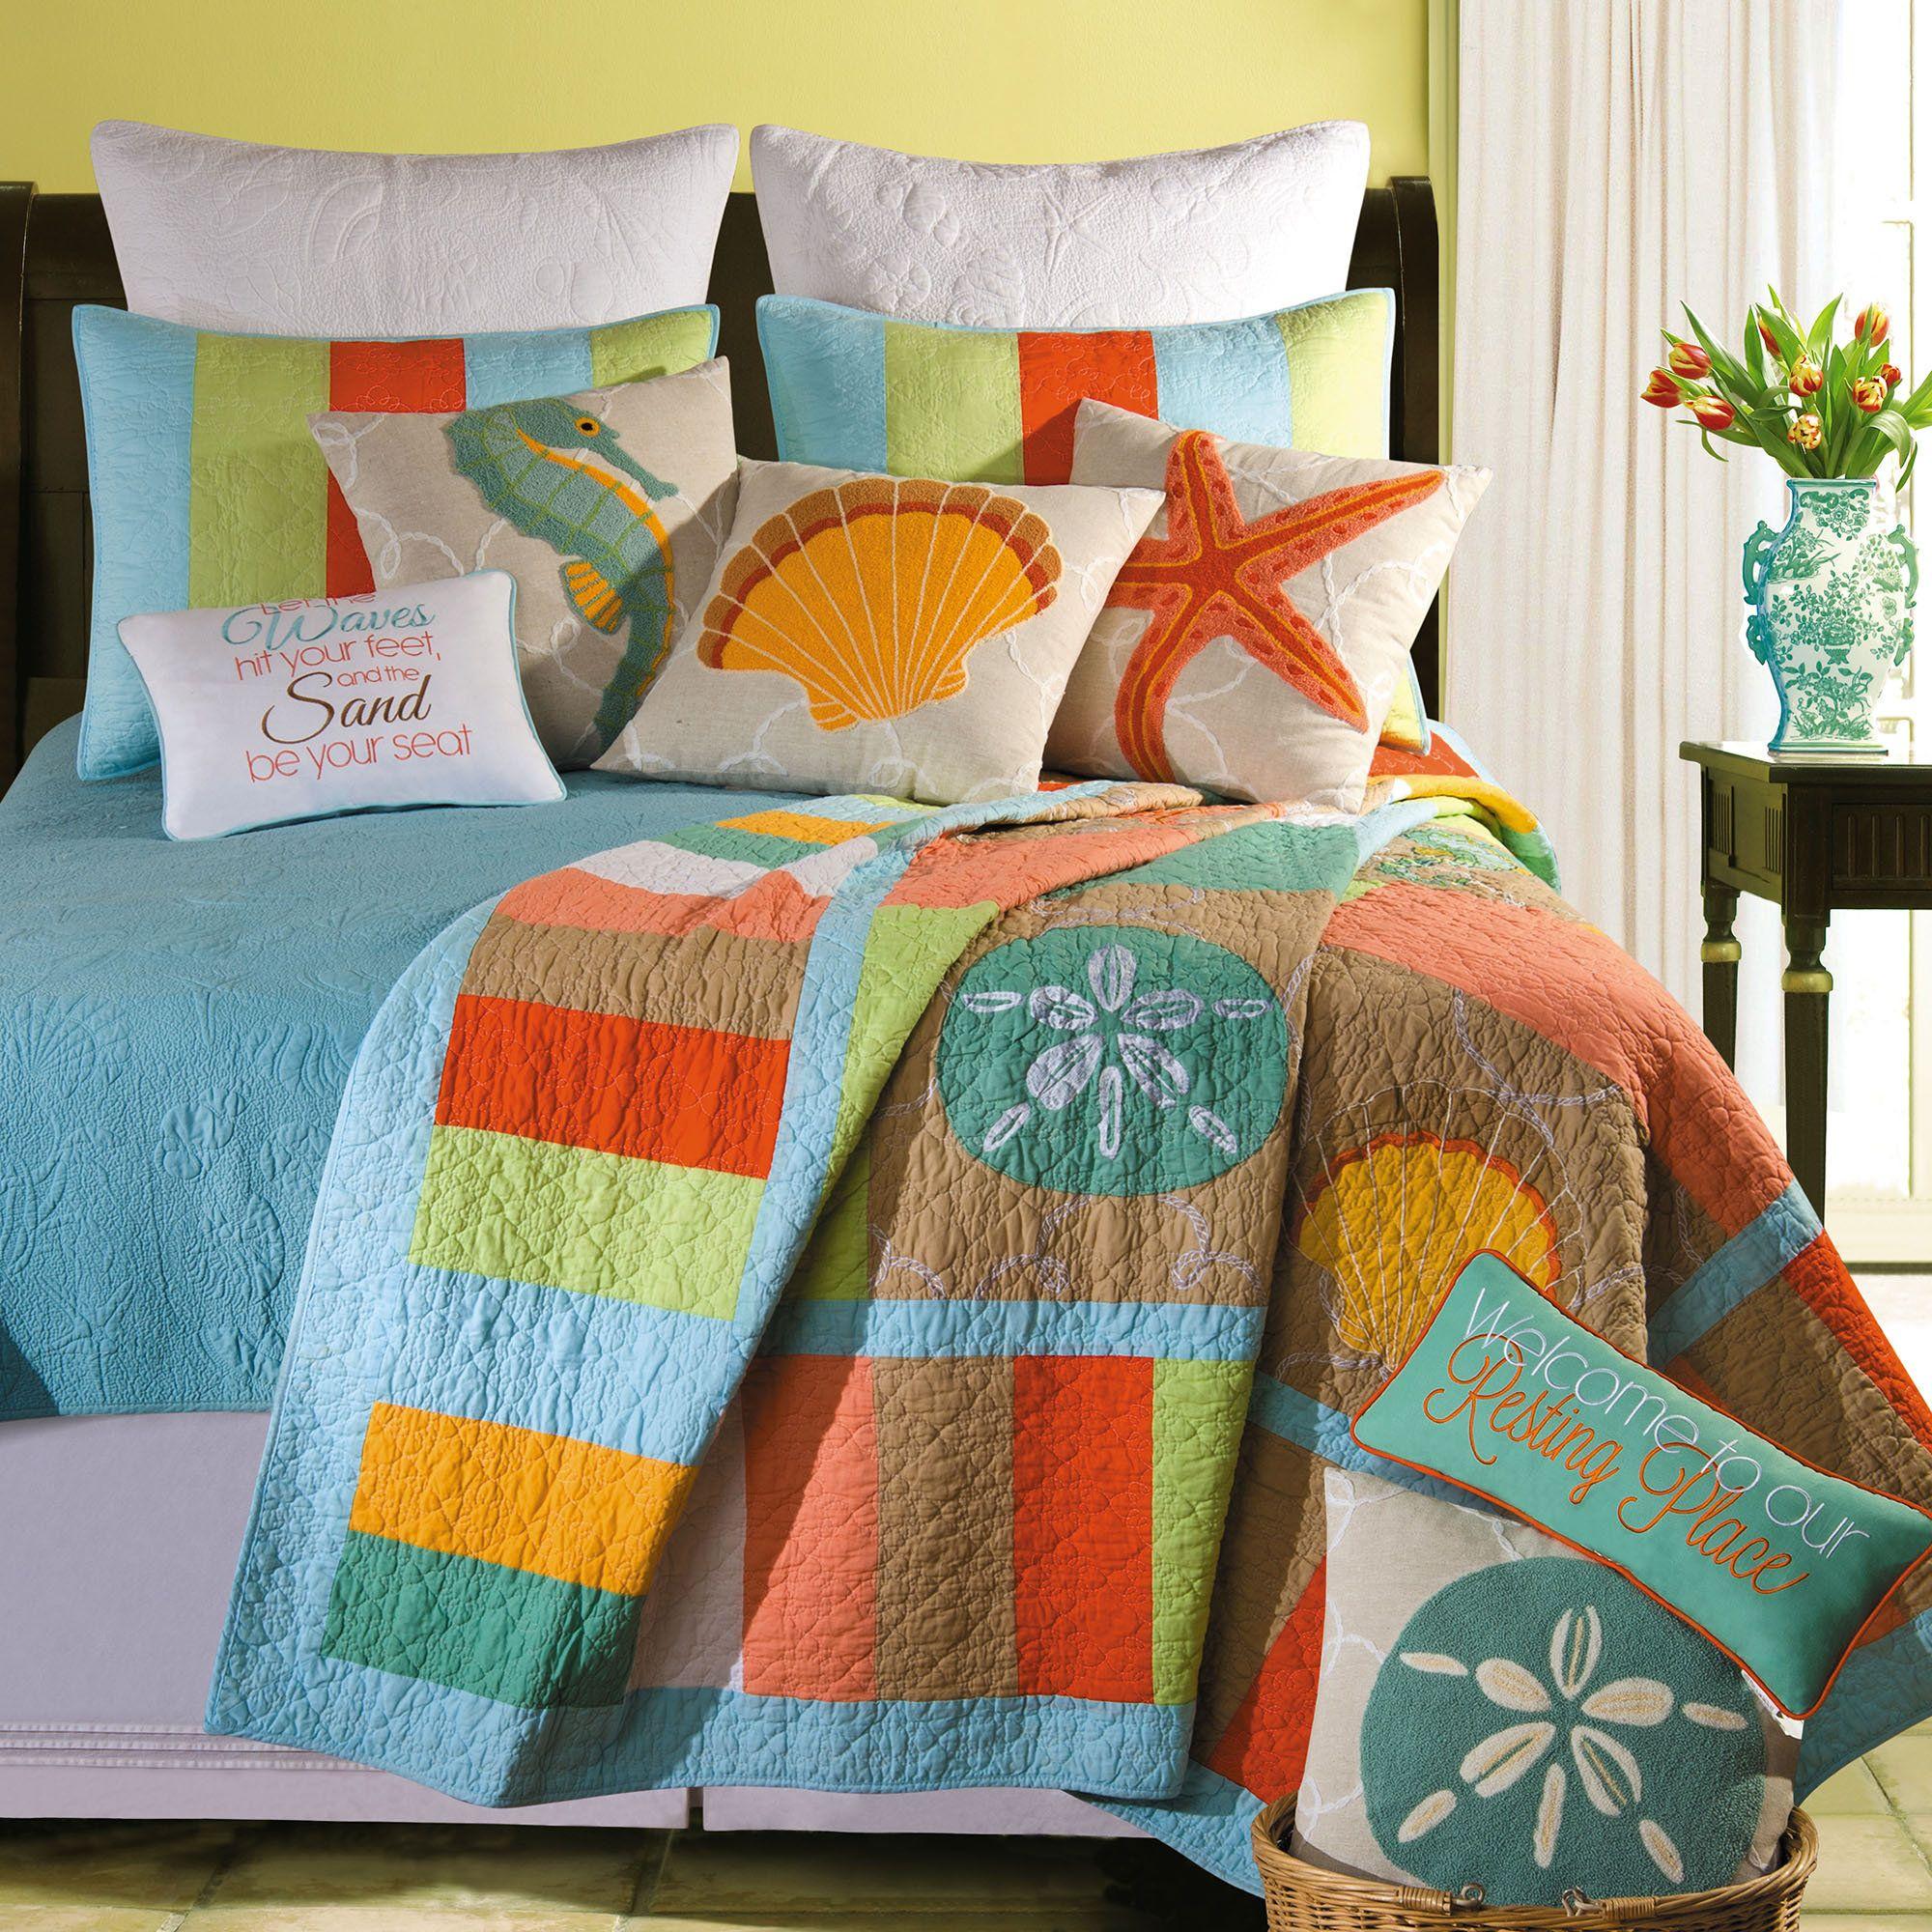 captivating 40 kids bedroom quilts inspiration design of be